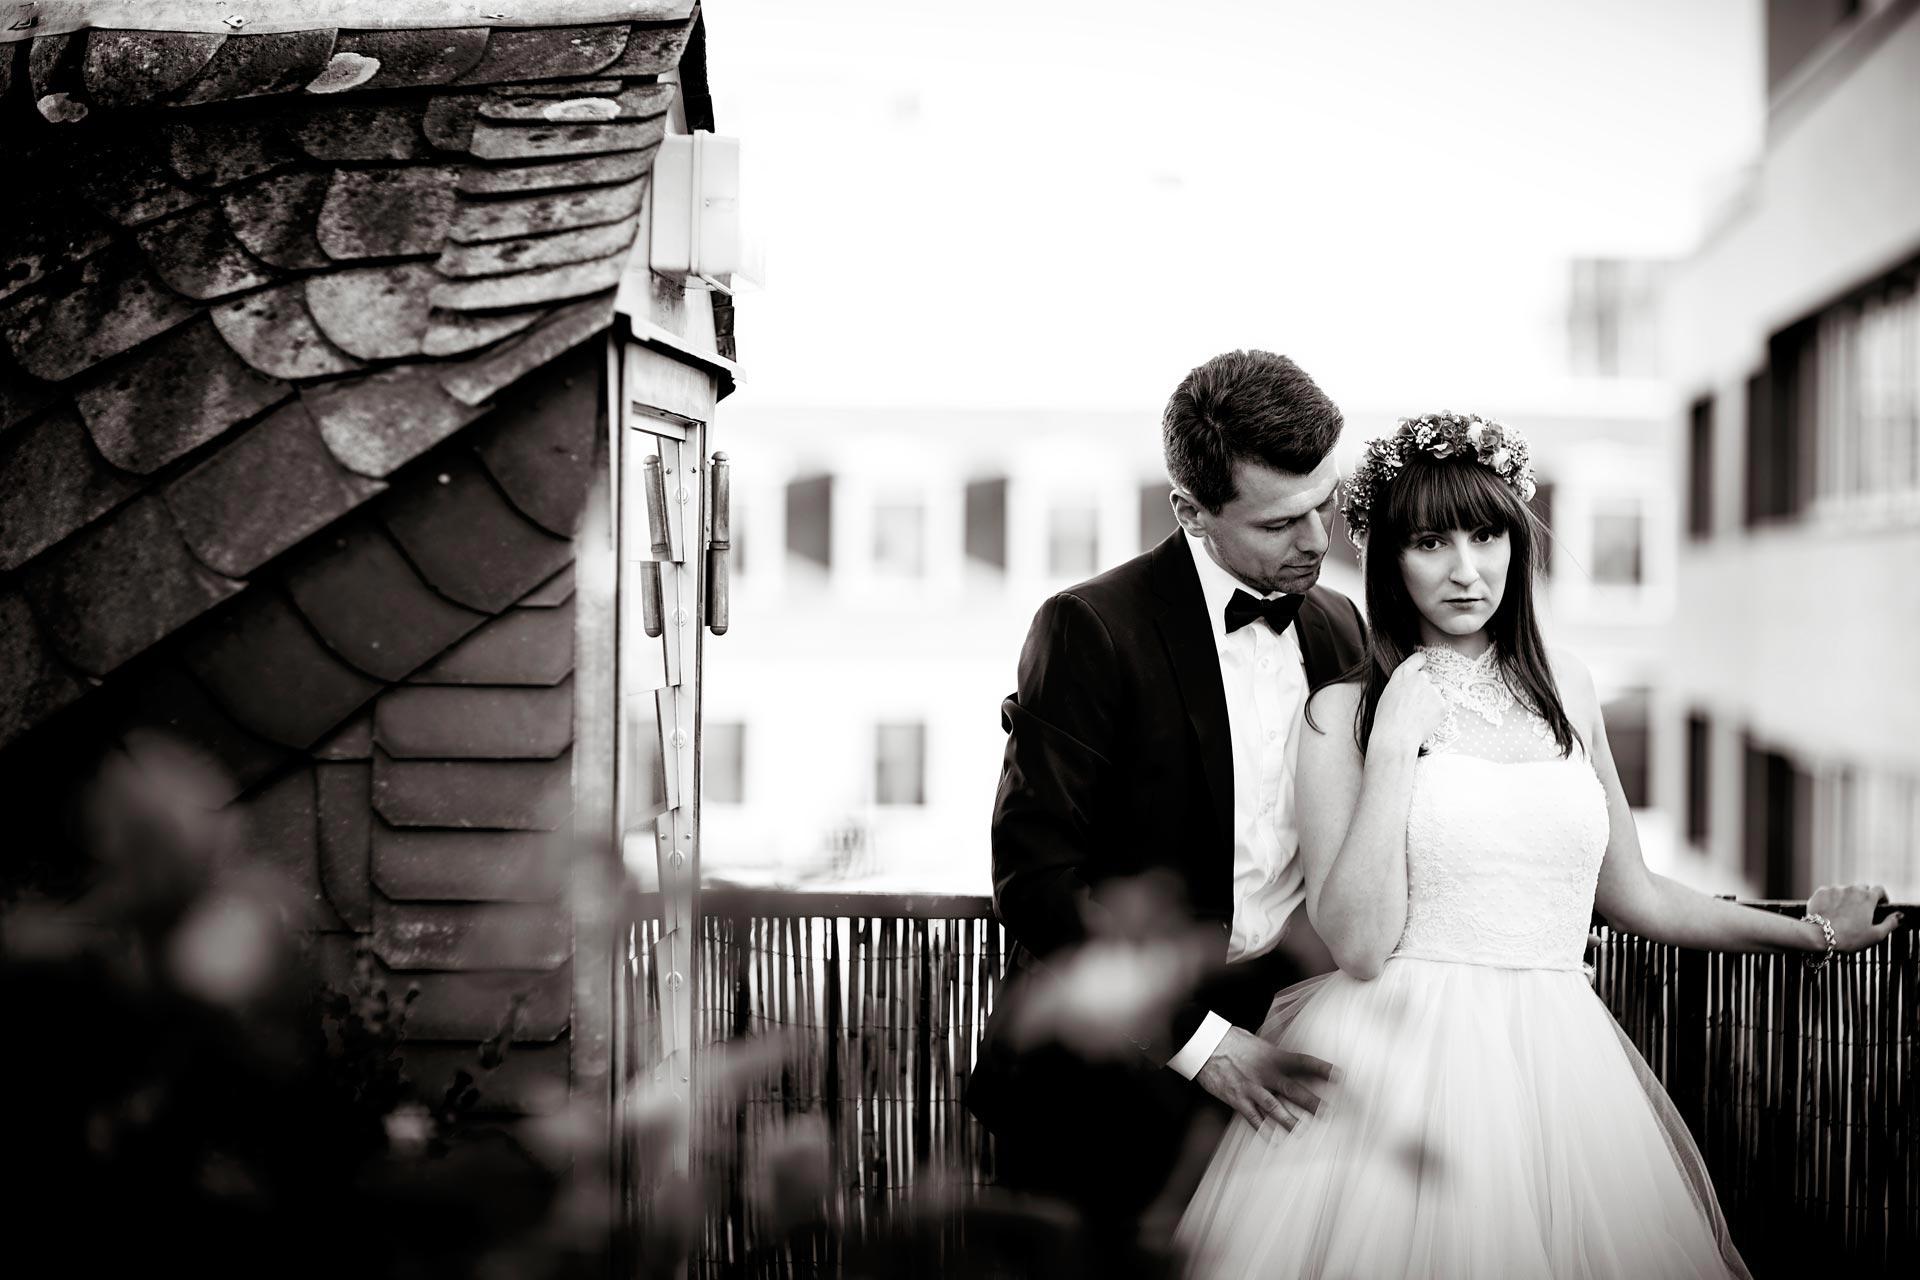 KM_087_-1_Das-Brautpaar